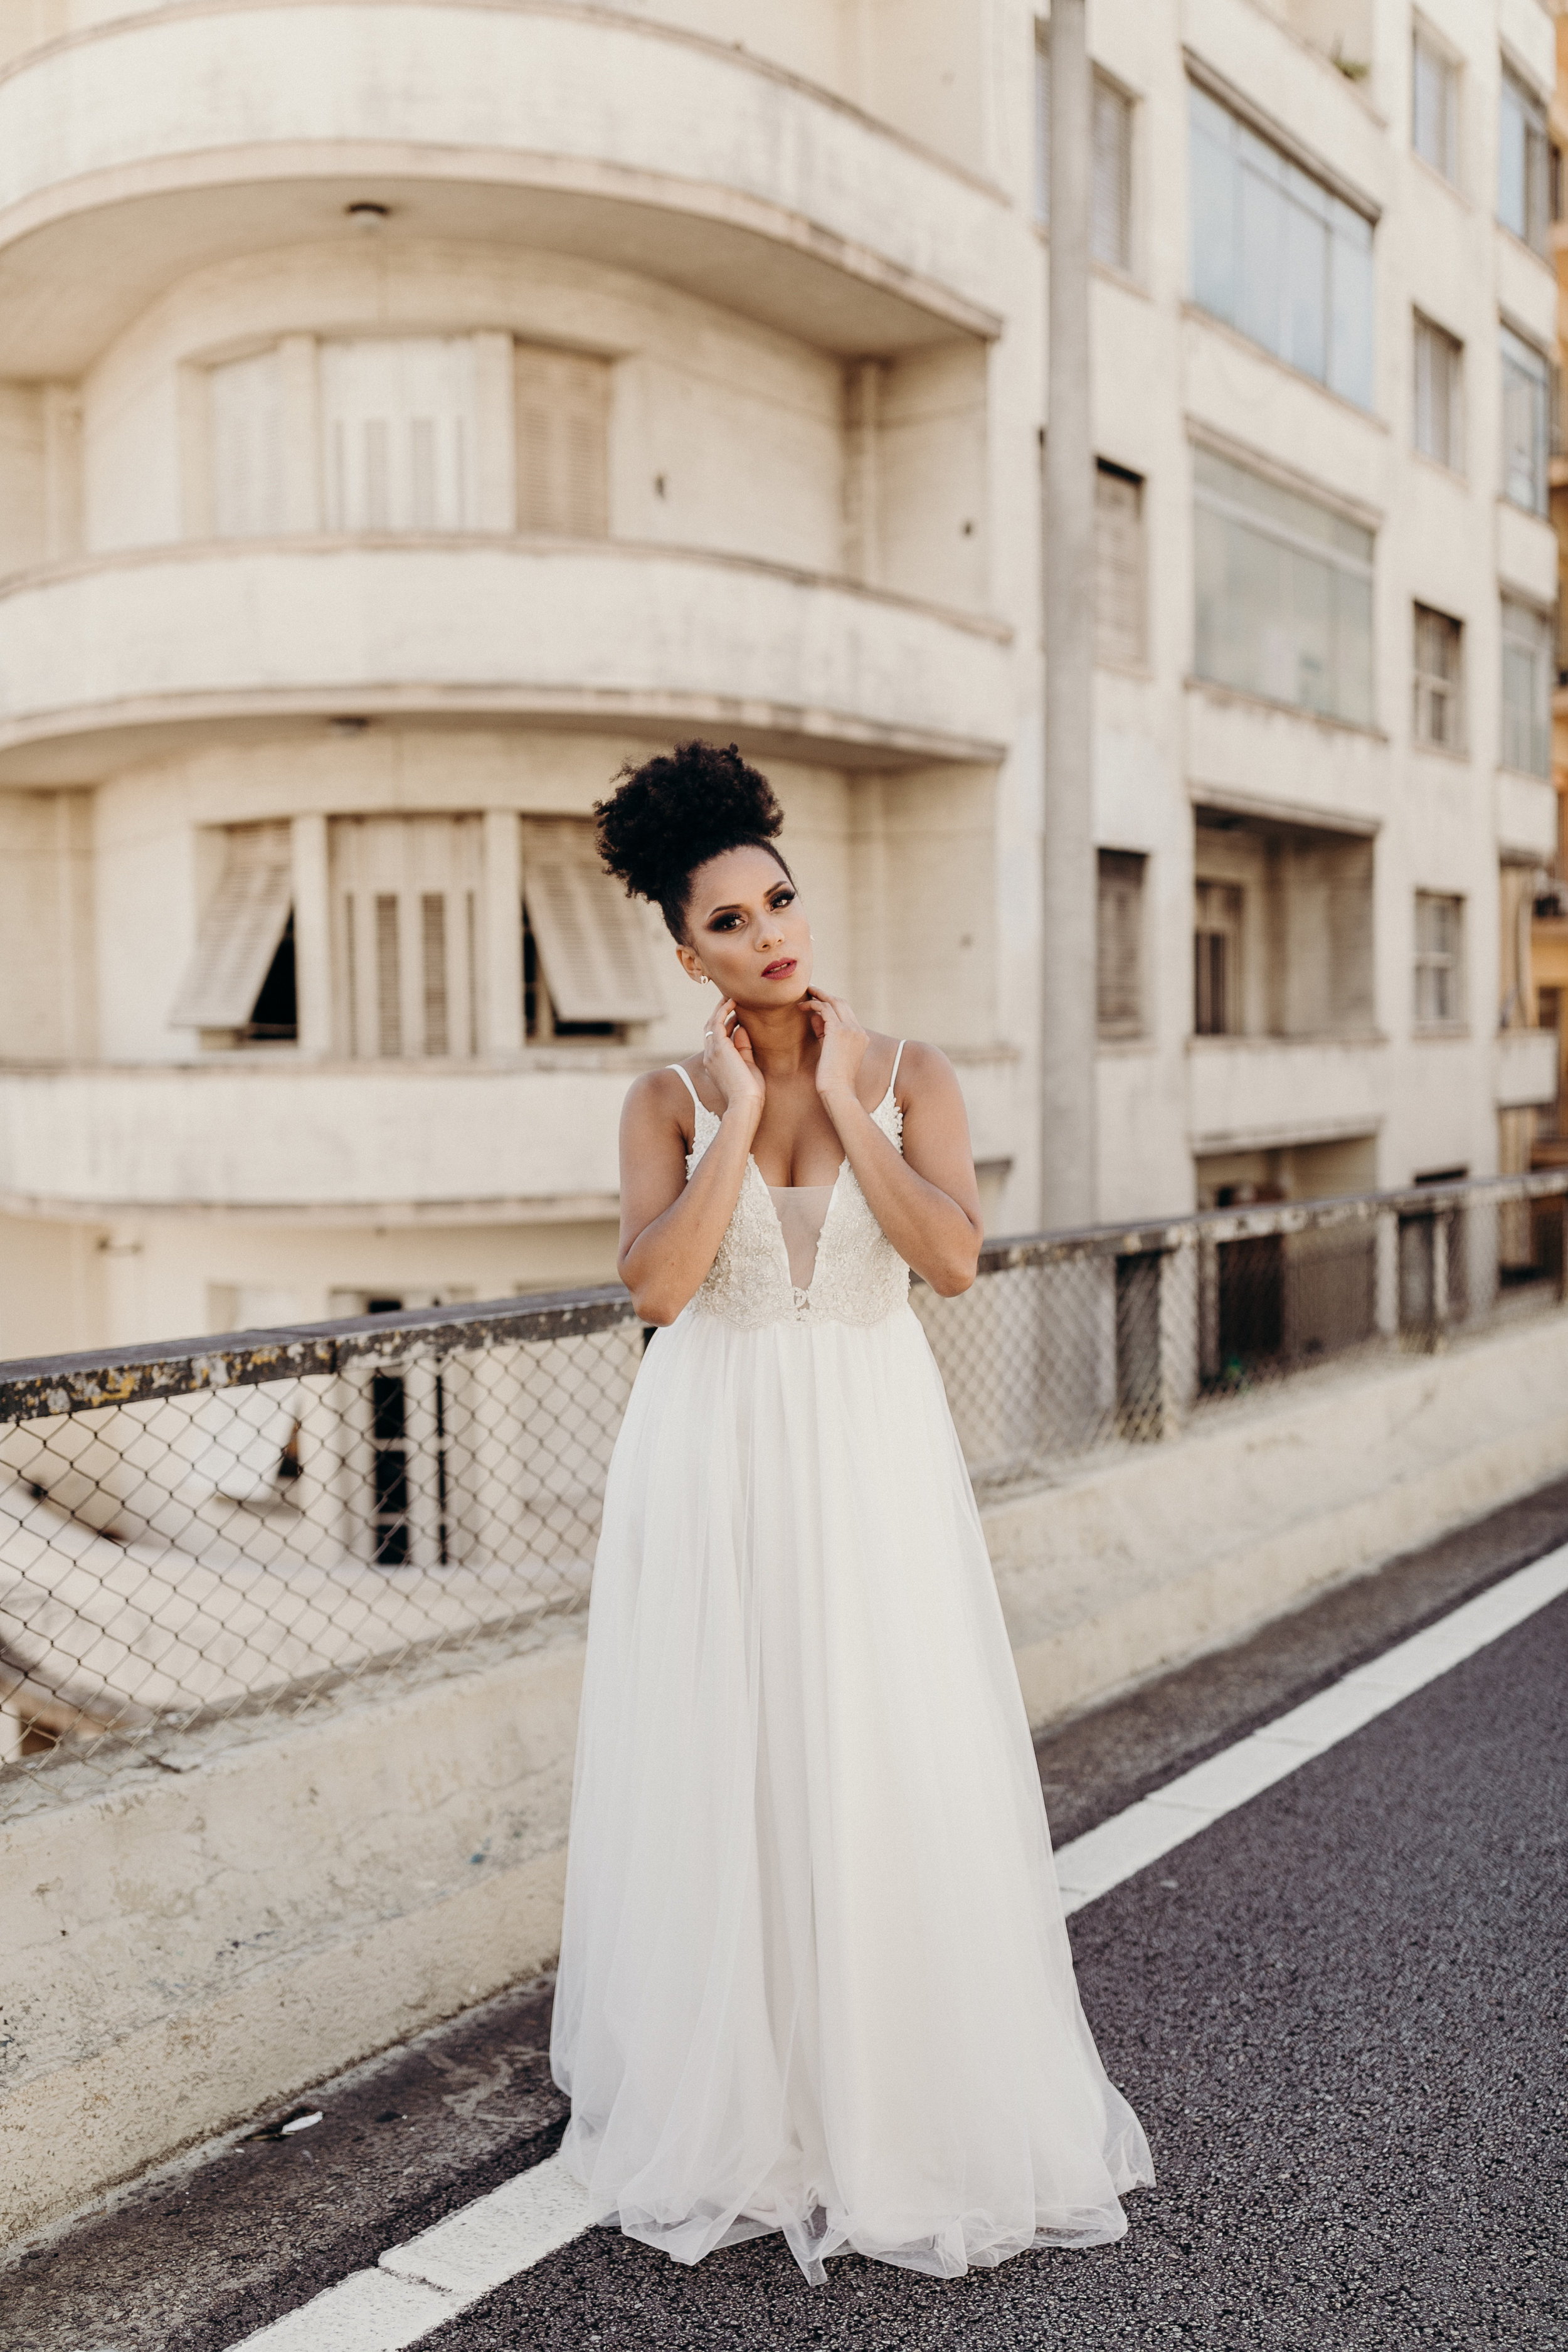 minhocao editorial - Victoria Bonvicini-225.jpg